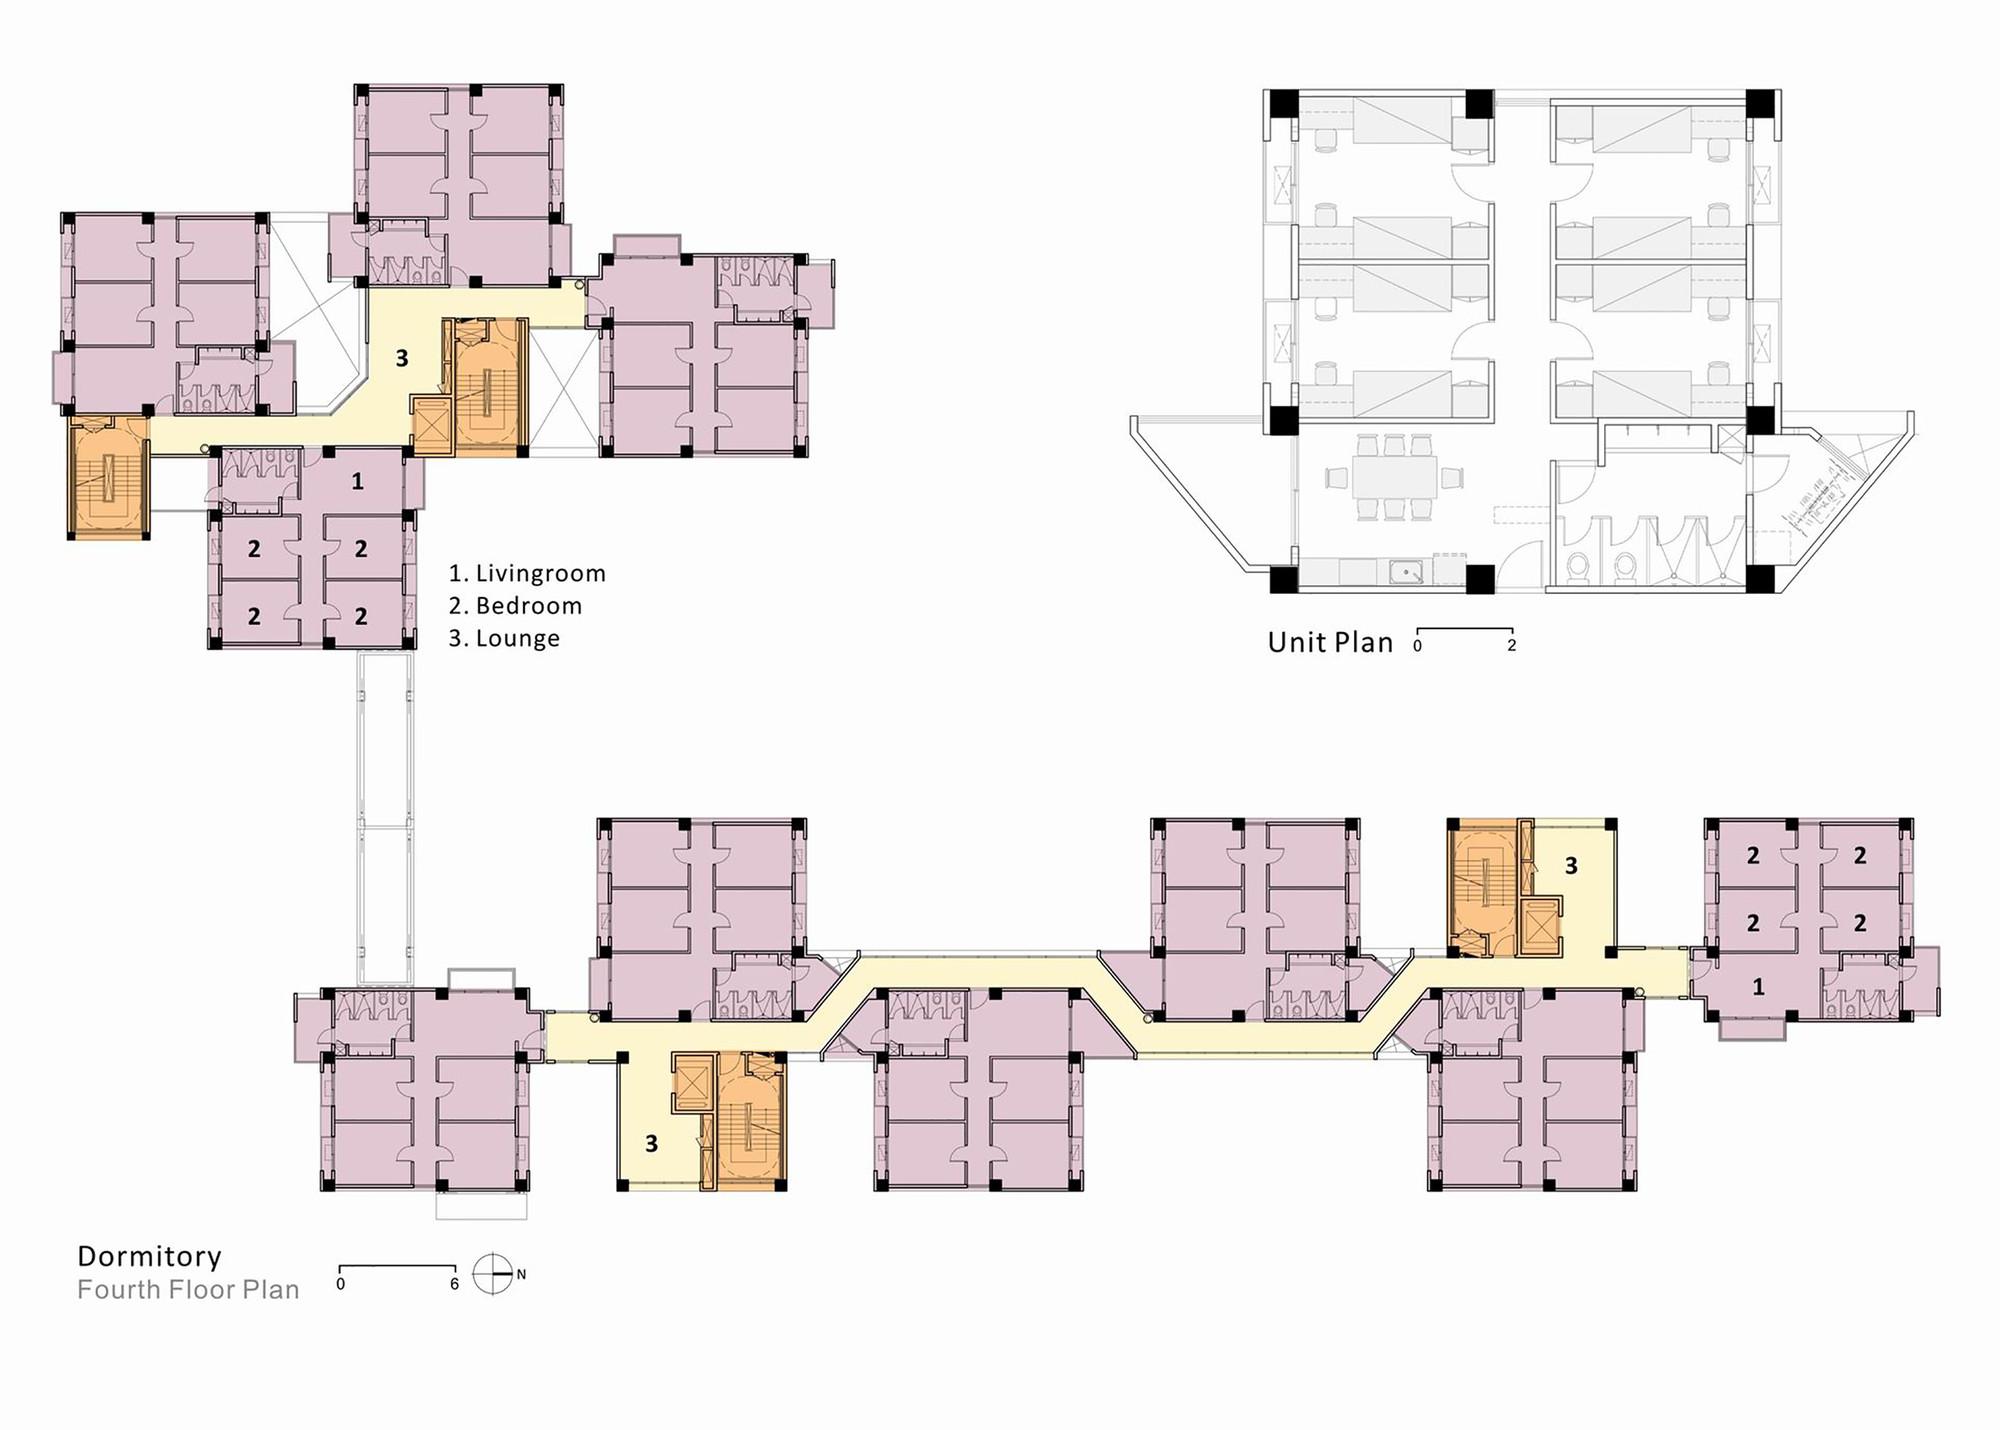 Phase Ii Building Complex Mackay Medical College J J